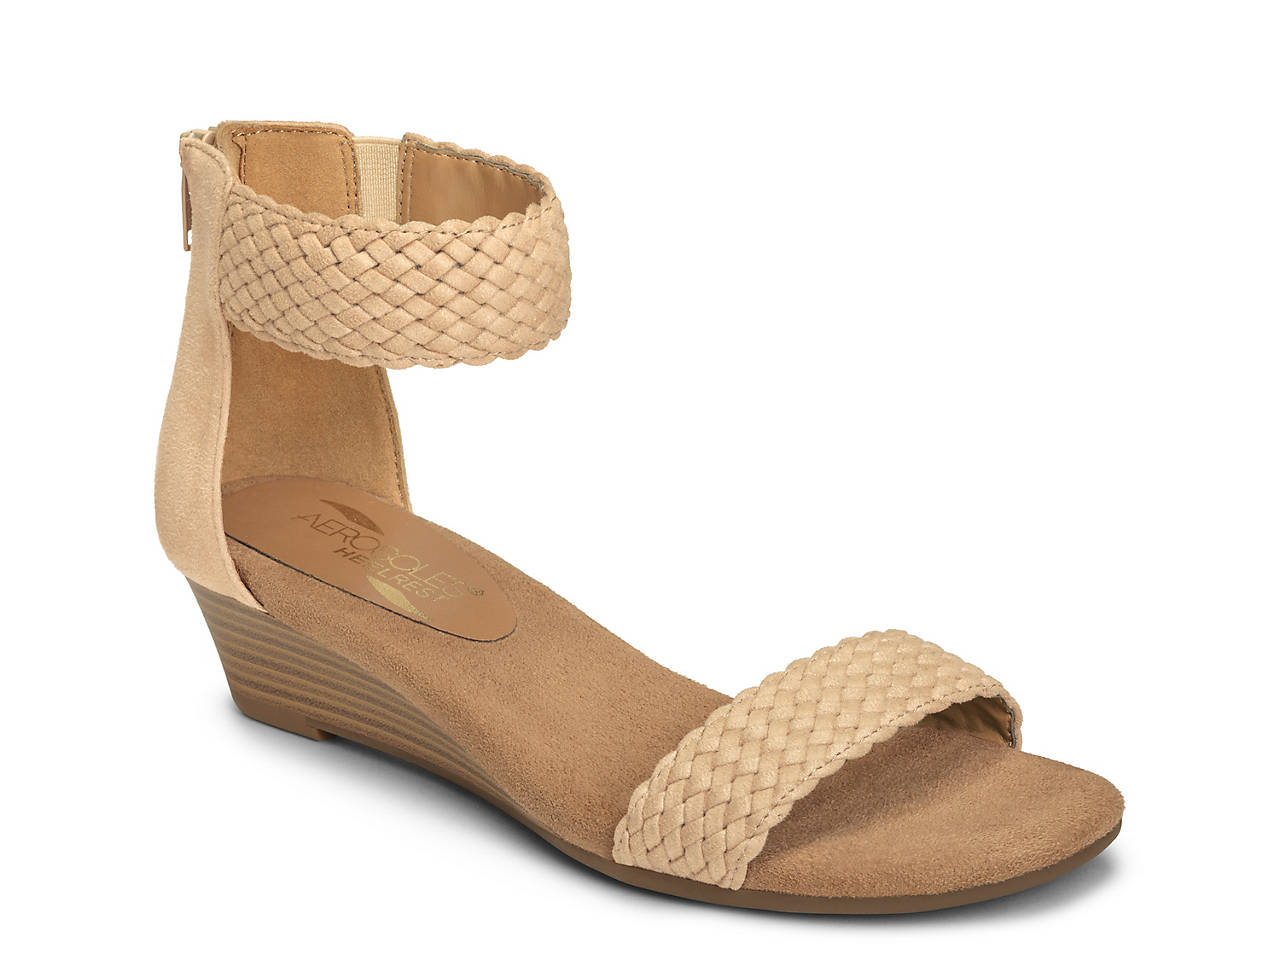 08cca57fe182 Aerosoles Yetroactive Wedge Sandal Women s Shoes